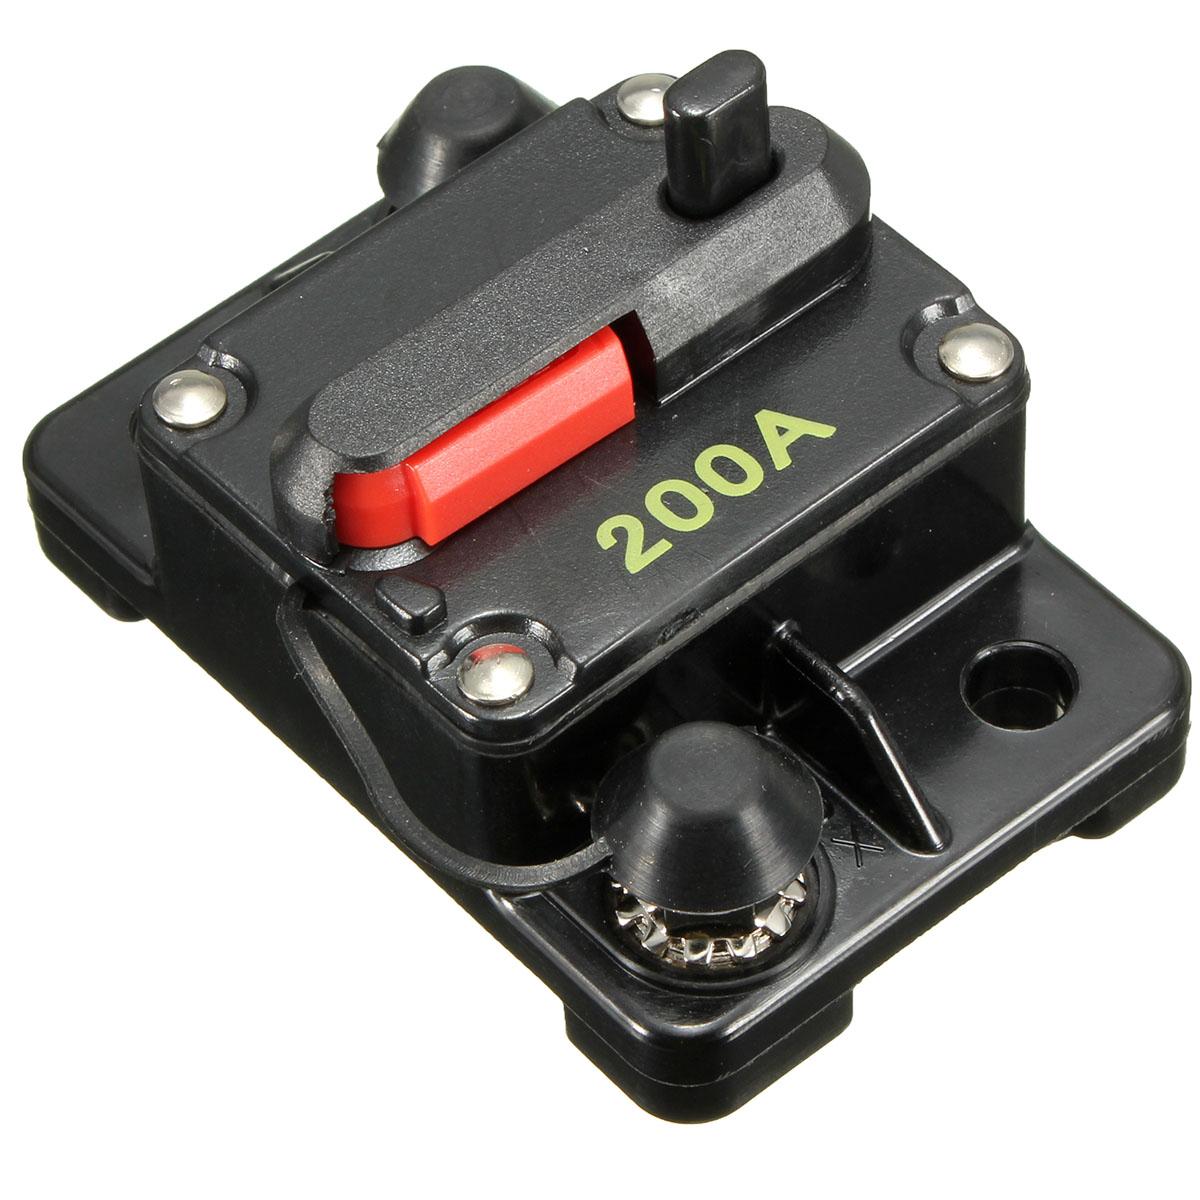 Battery circuit breaker k29 scent stone